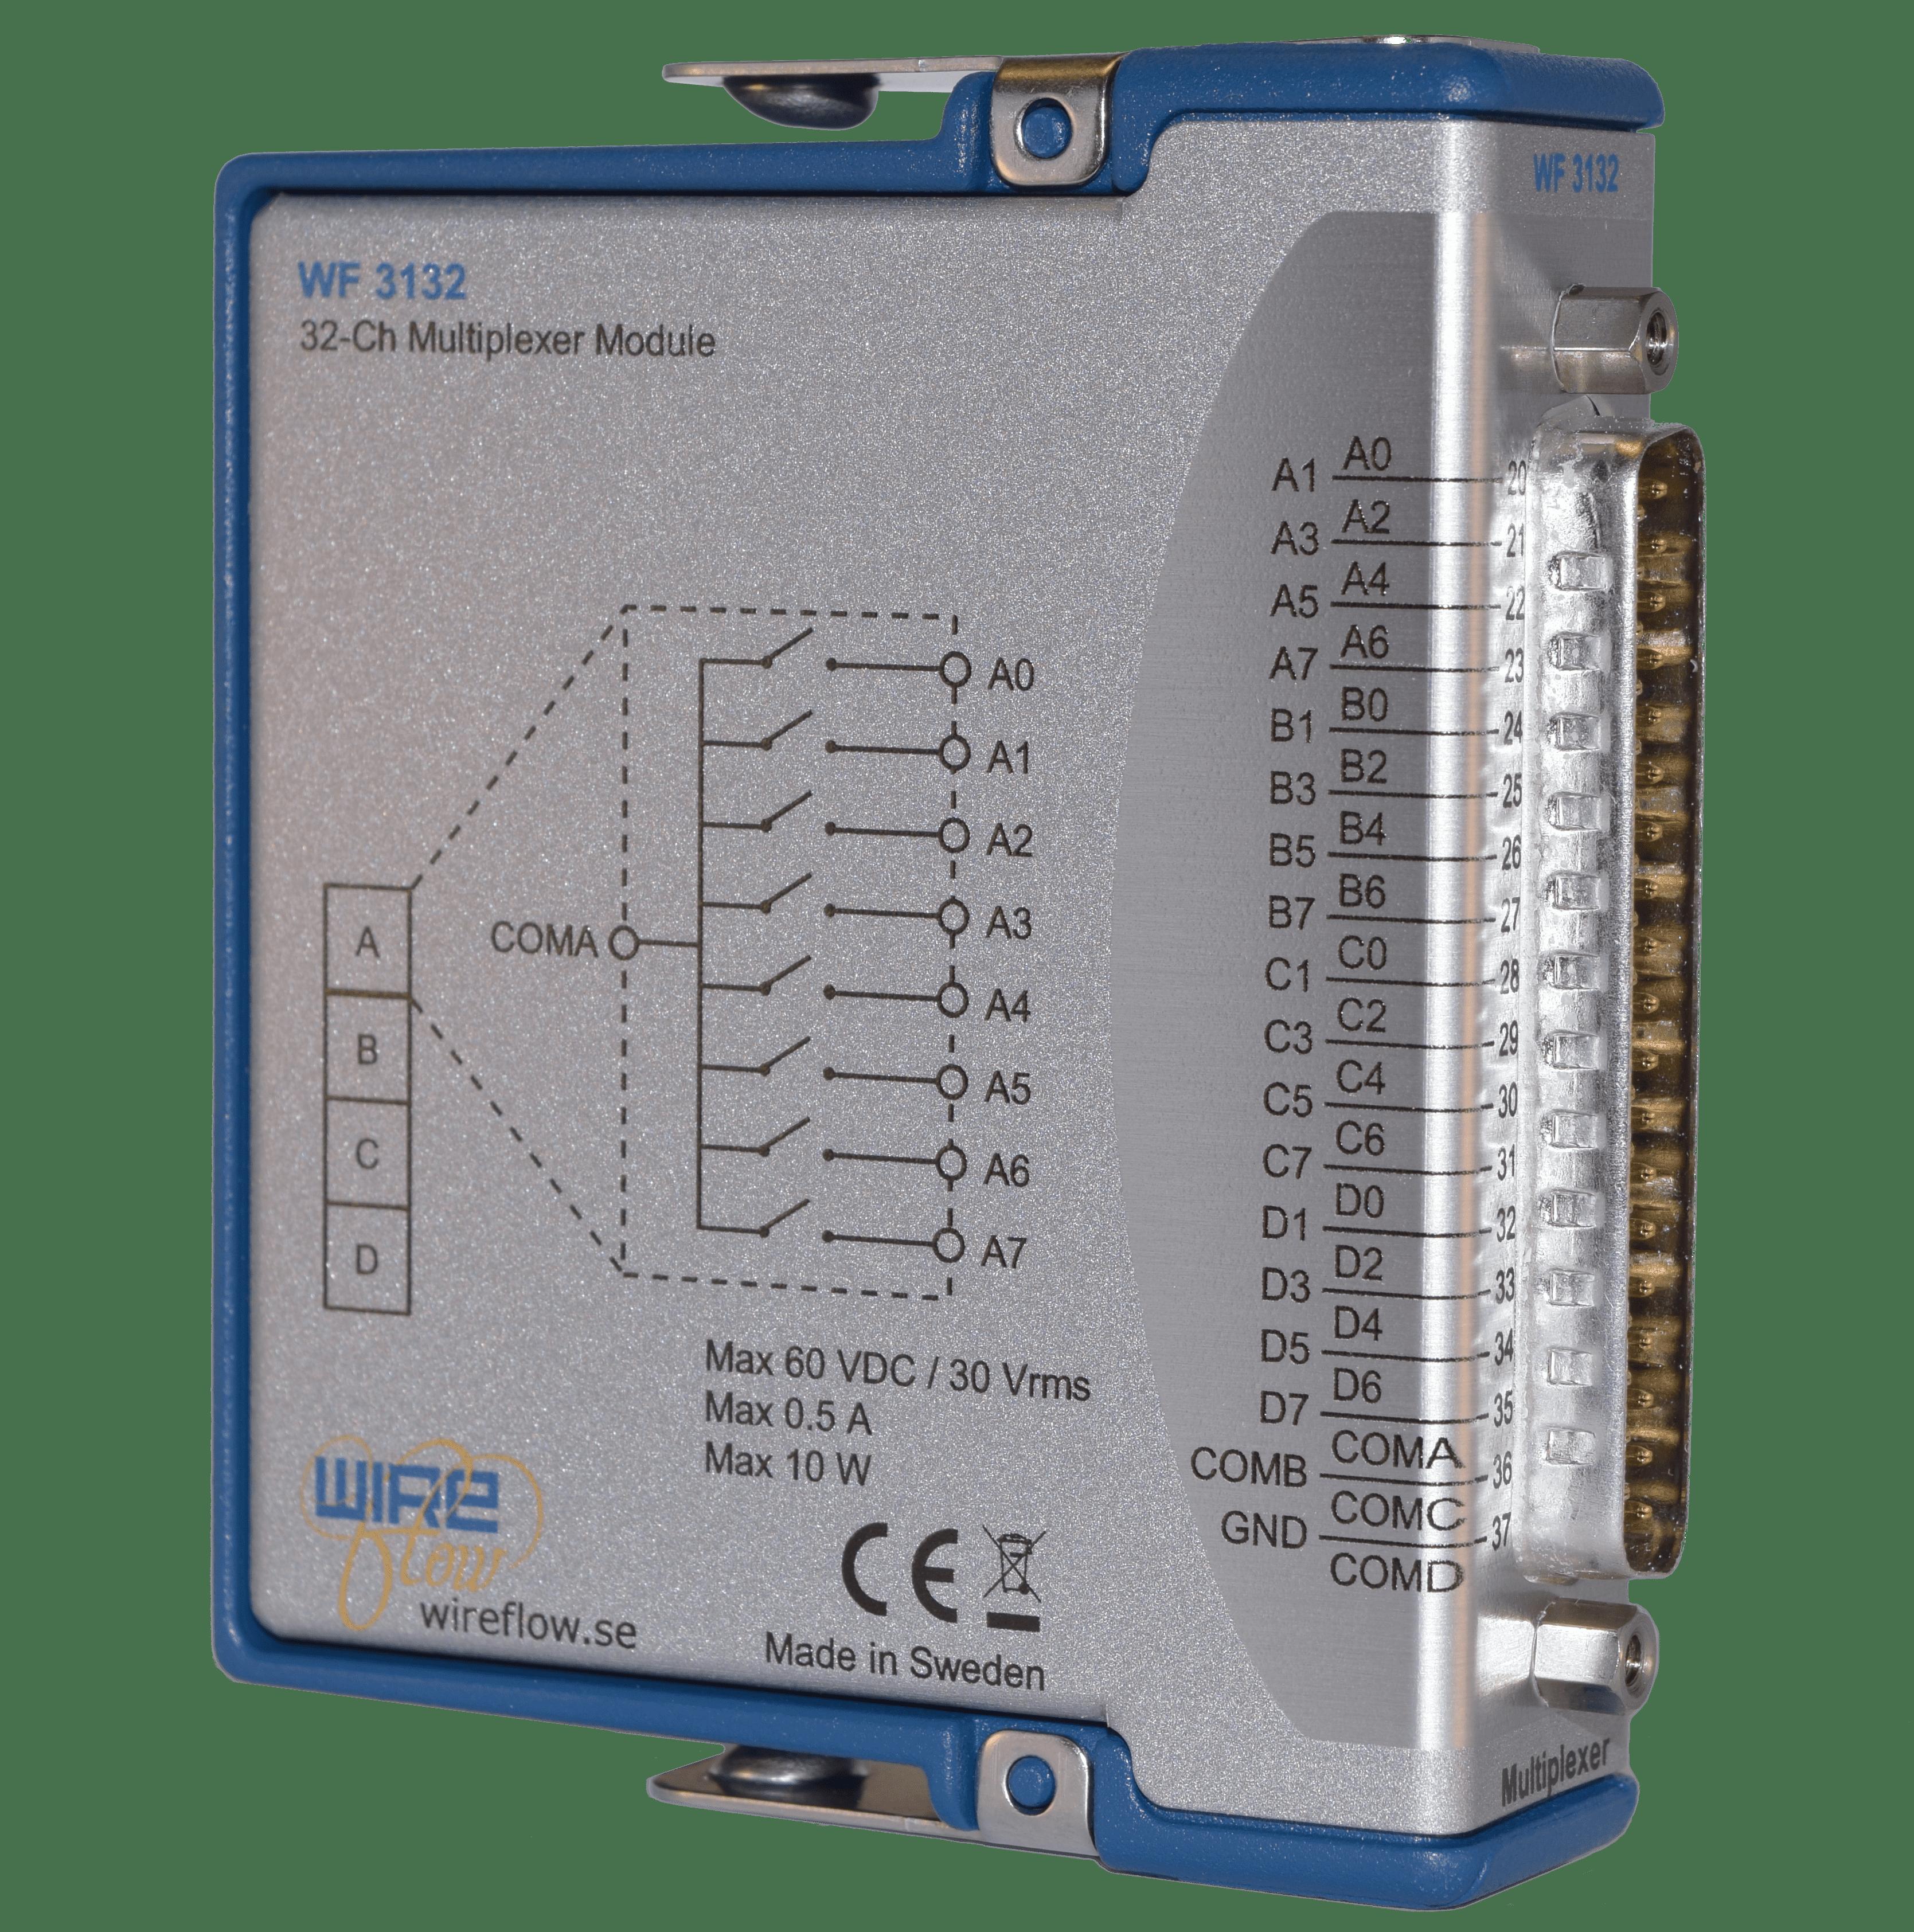 WF 3132 - Multiplexer Module